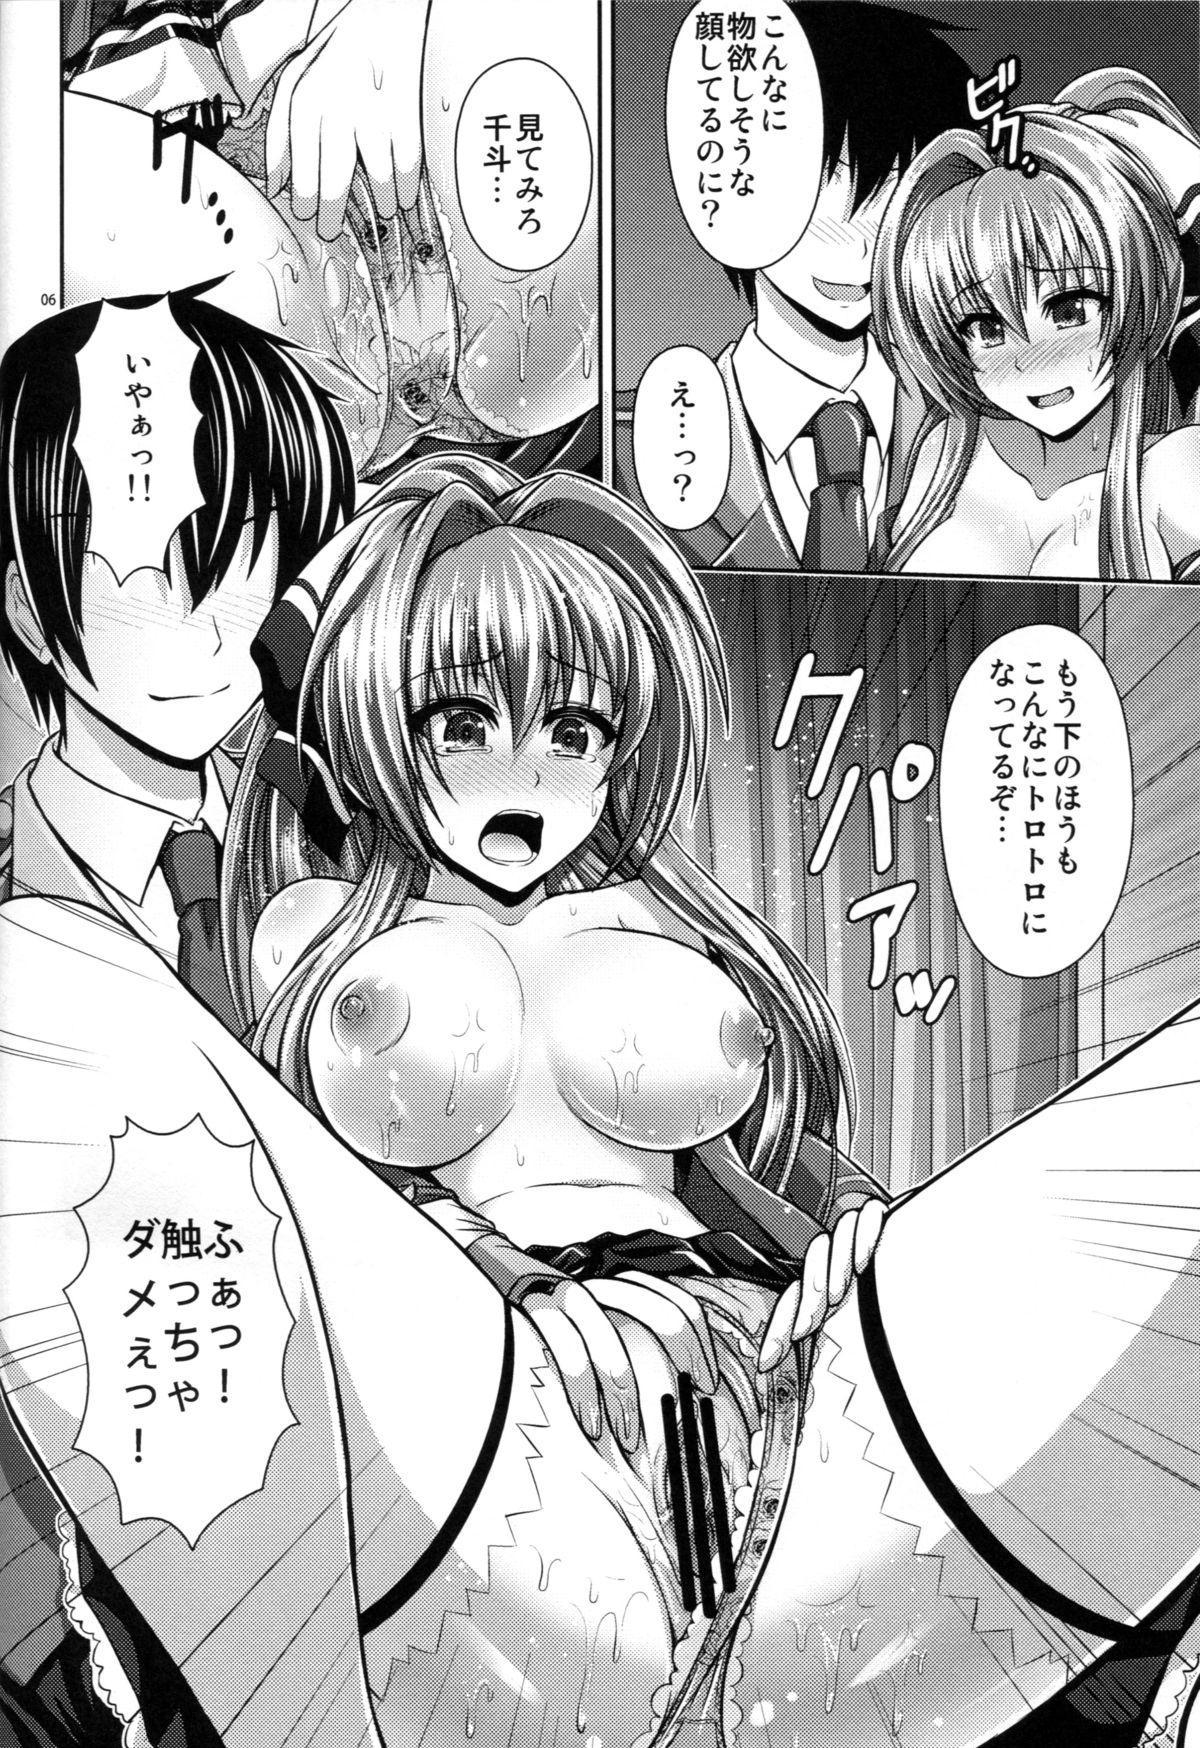 Ecchii Kimochi ga Tomannai! 4